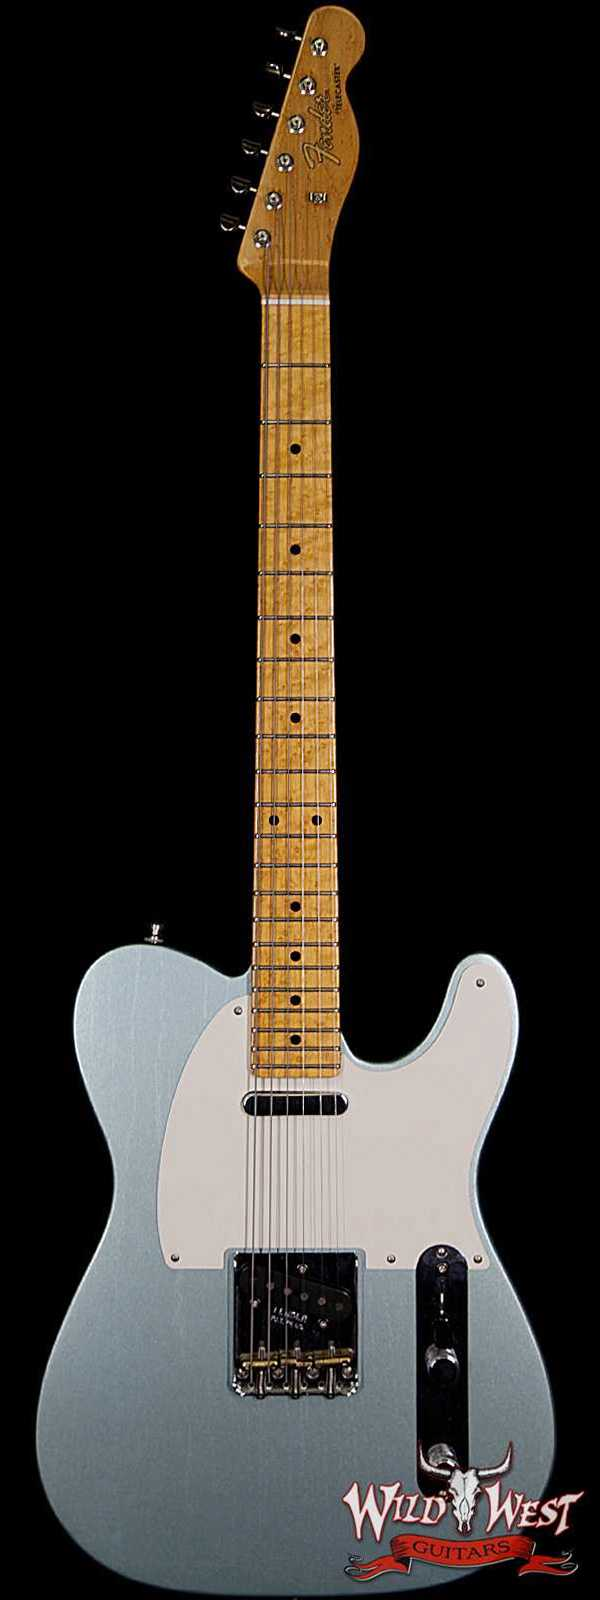 Fender Custom Shop Postmodern Telecaster Lush Closet Classic Birdseye Maple Neck Faded Firemist Silver